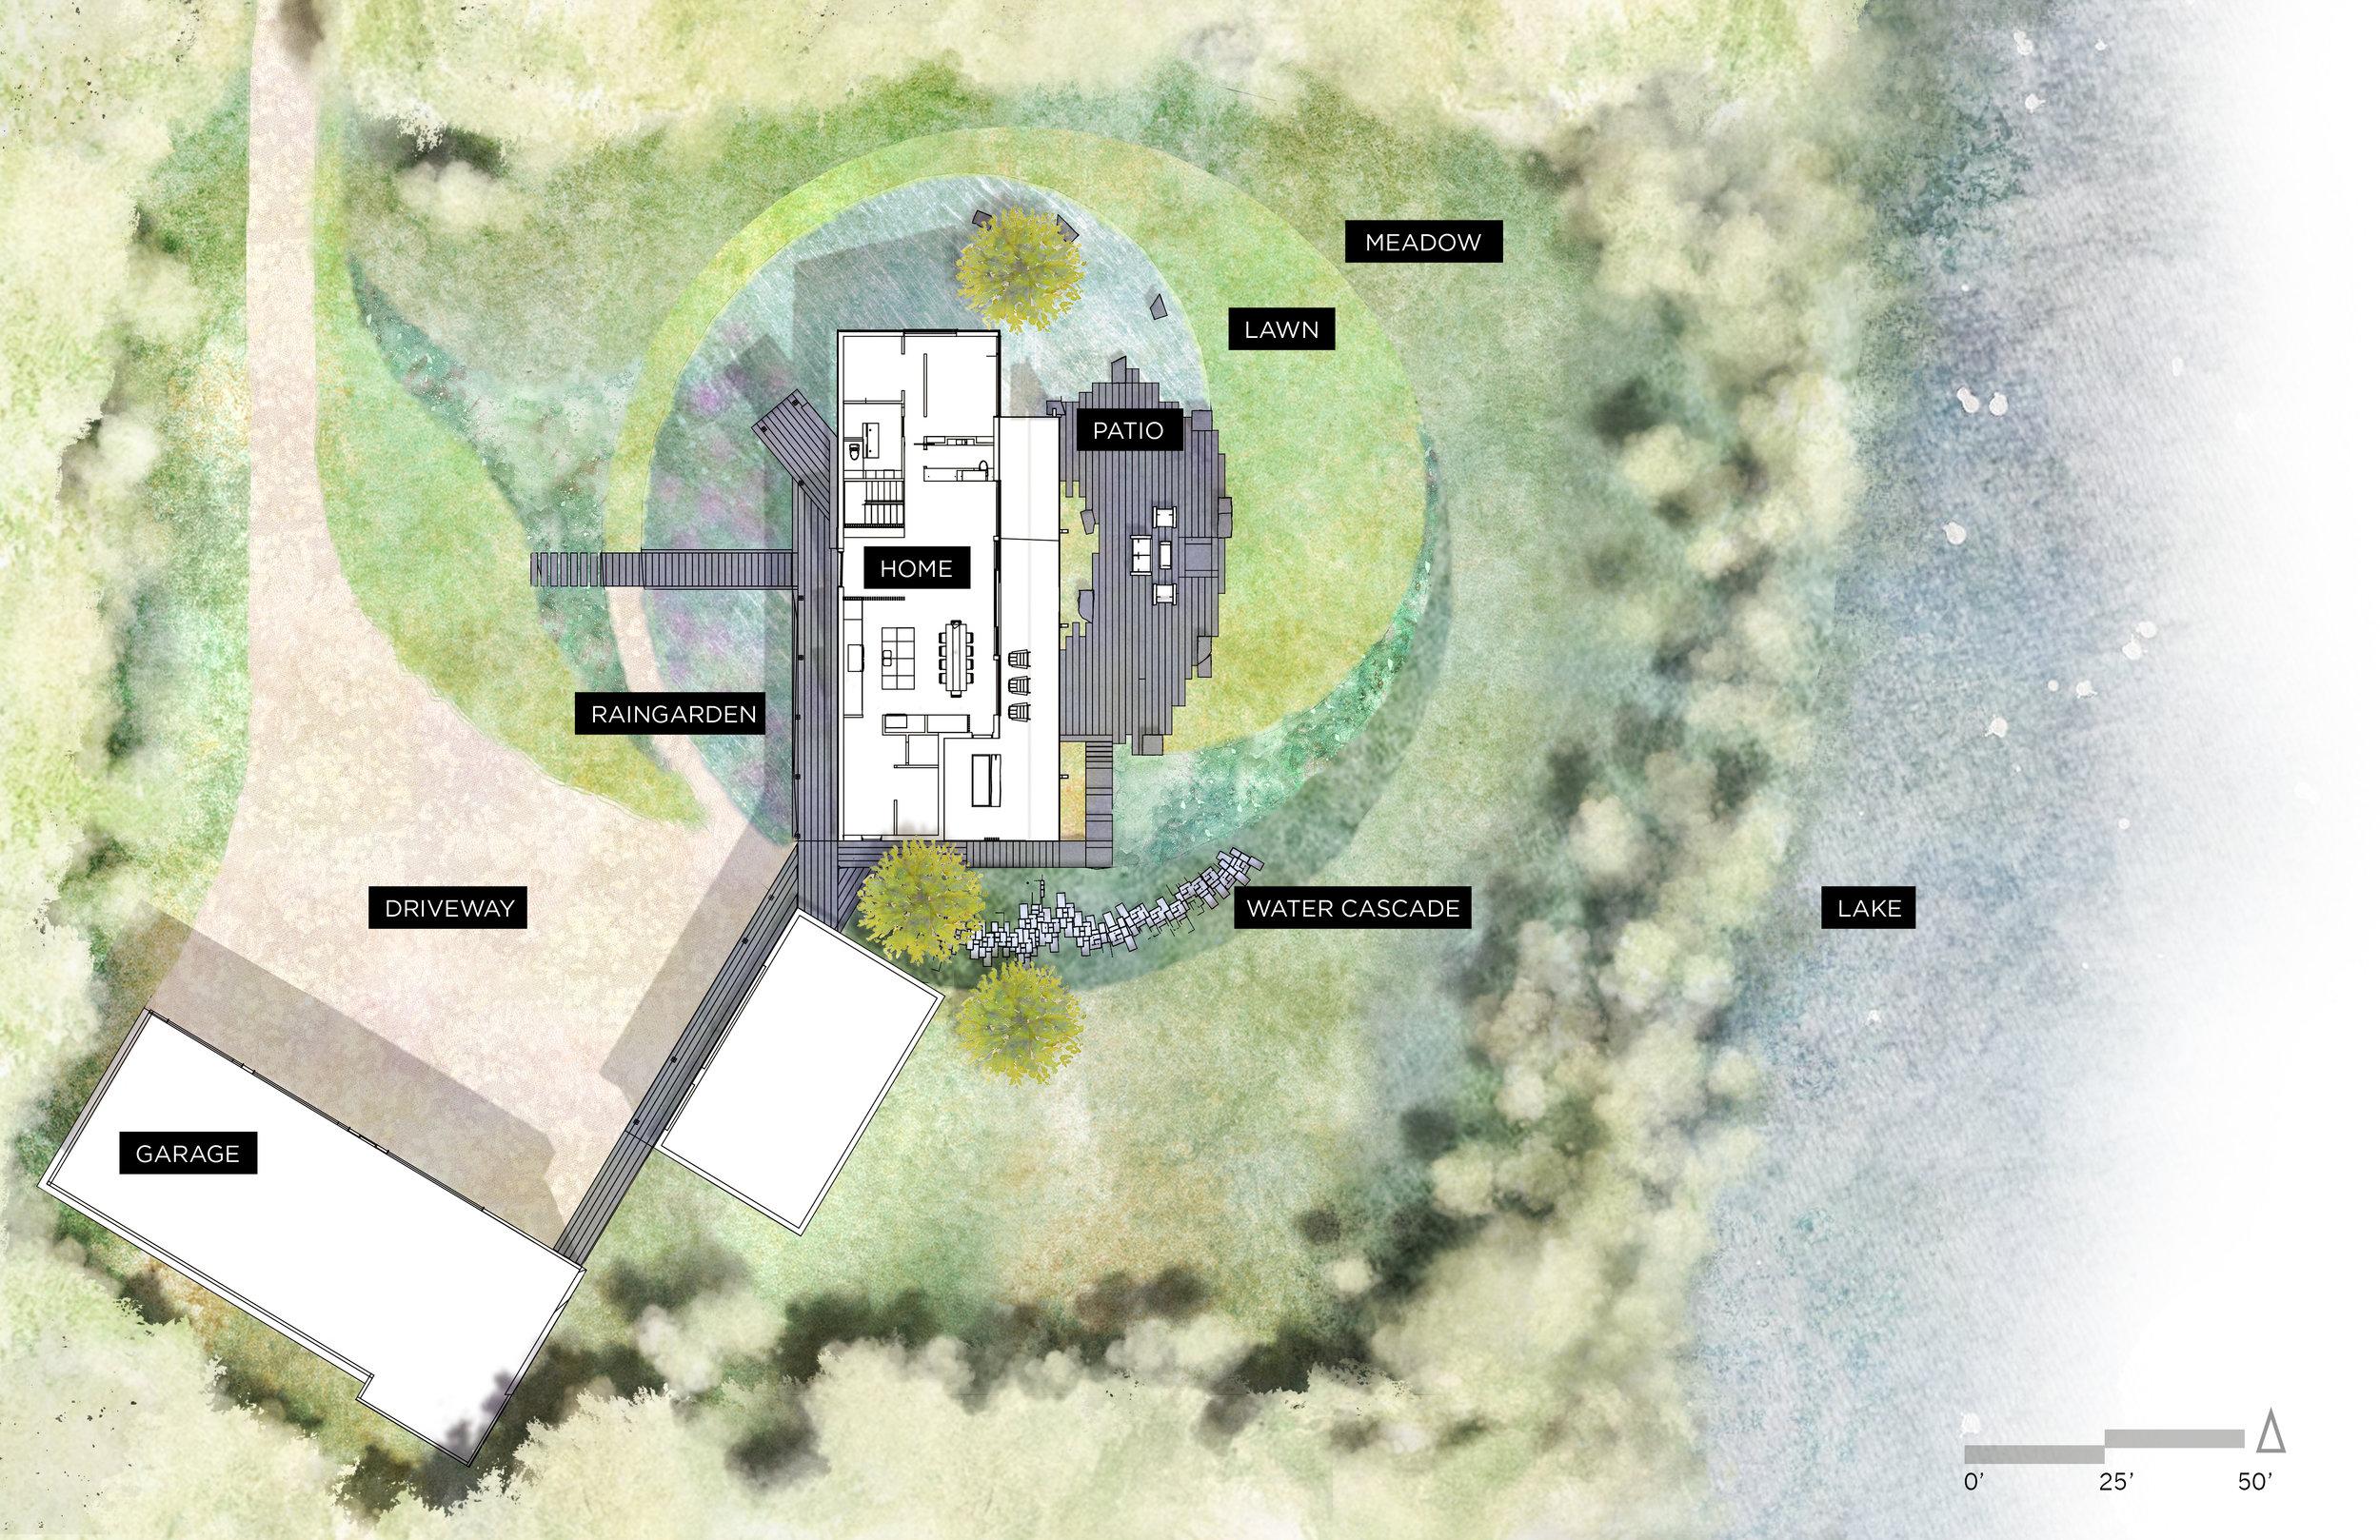 Residential Site Plan